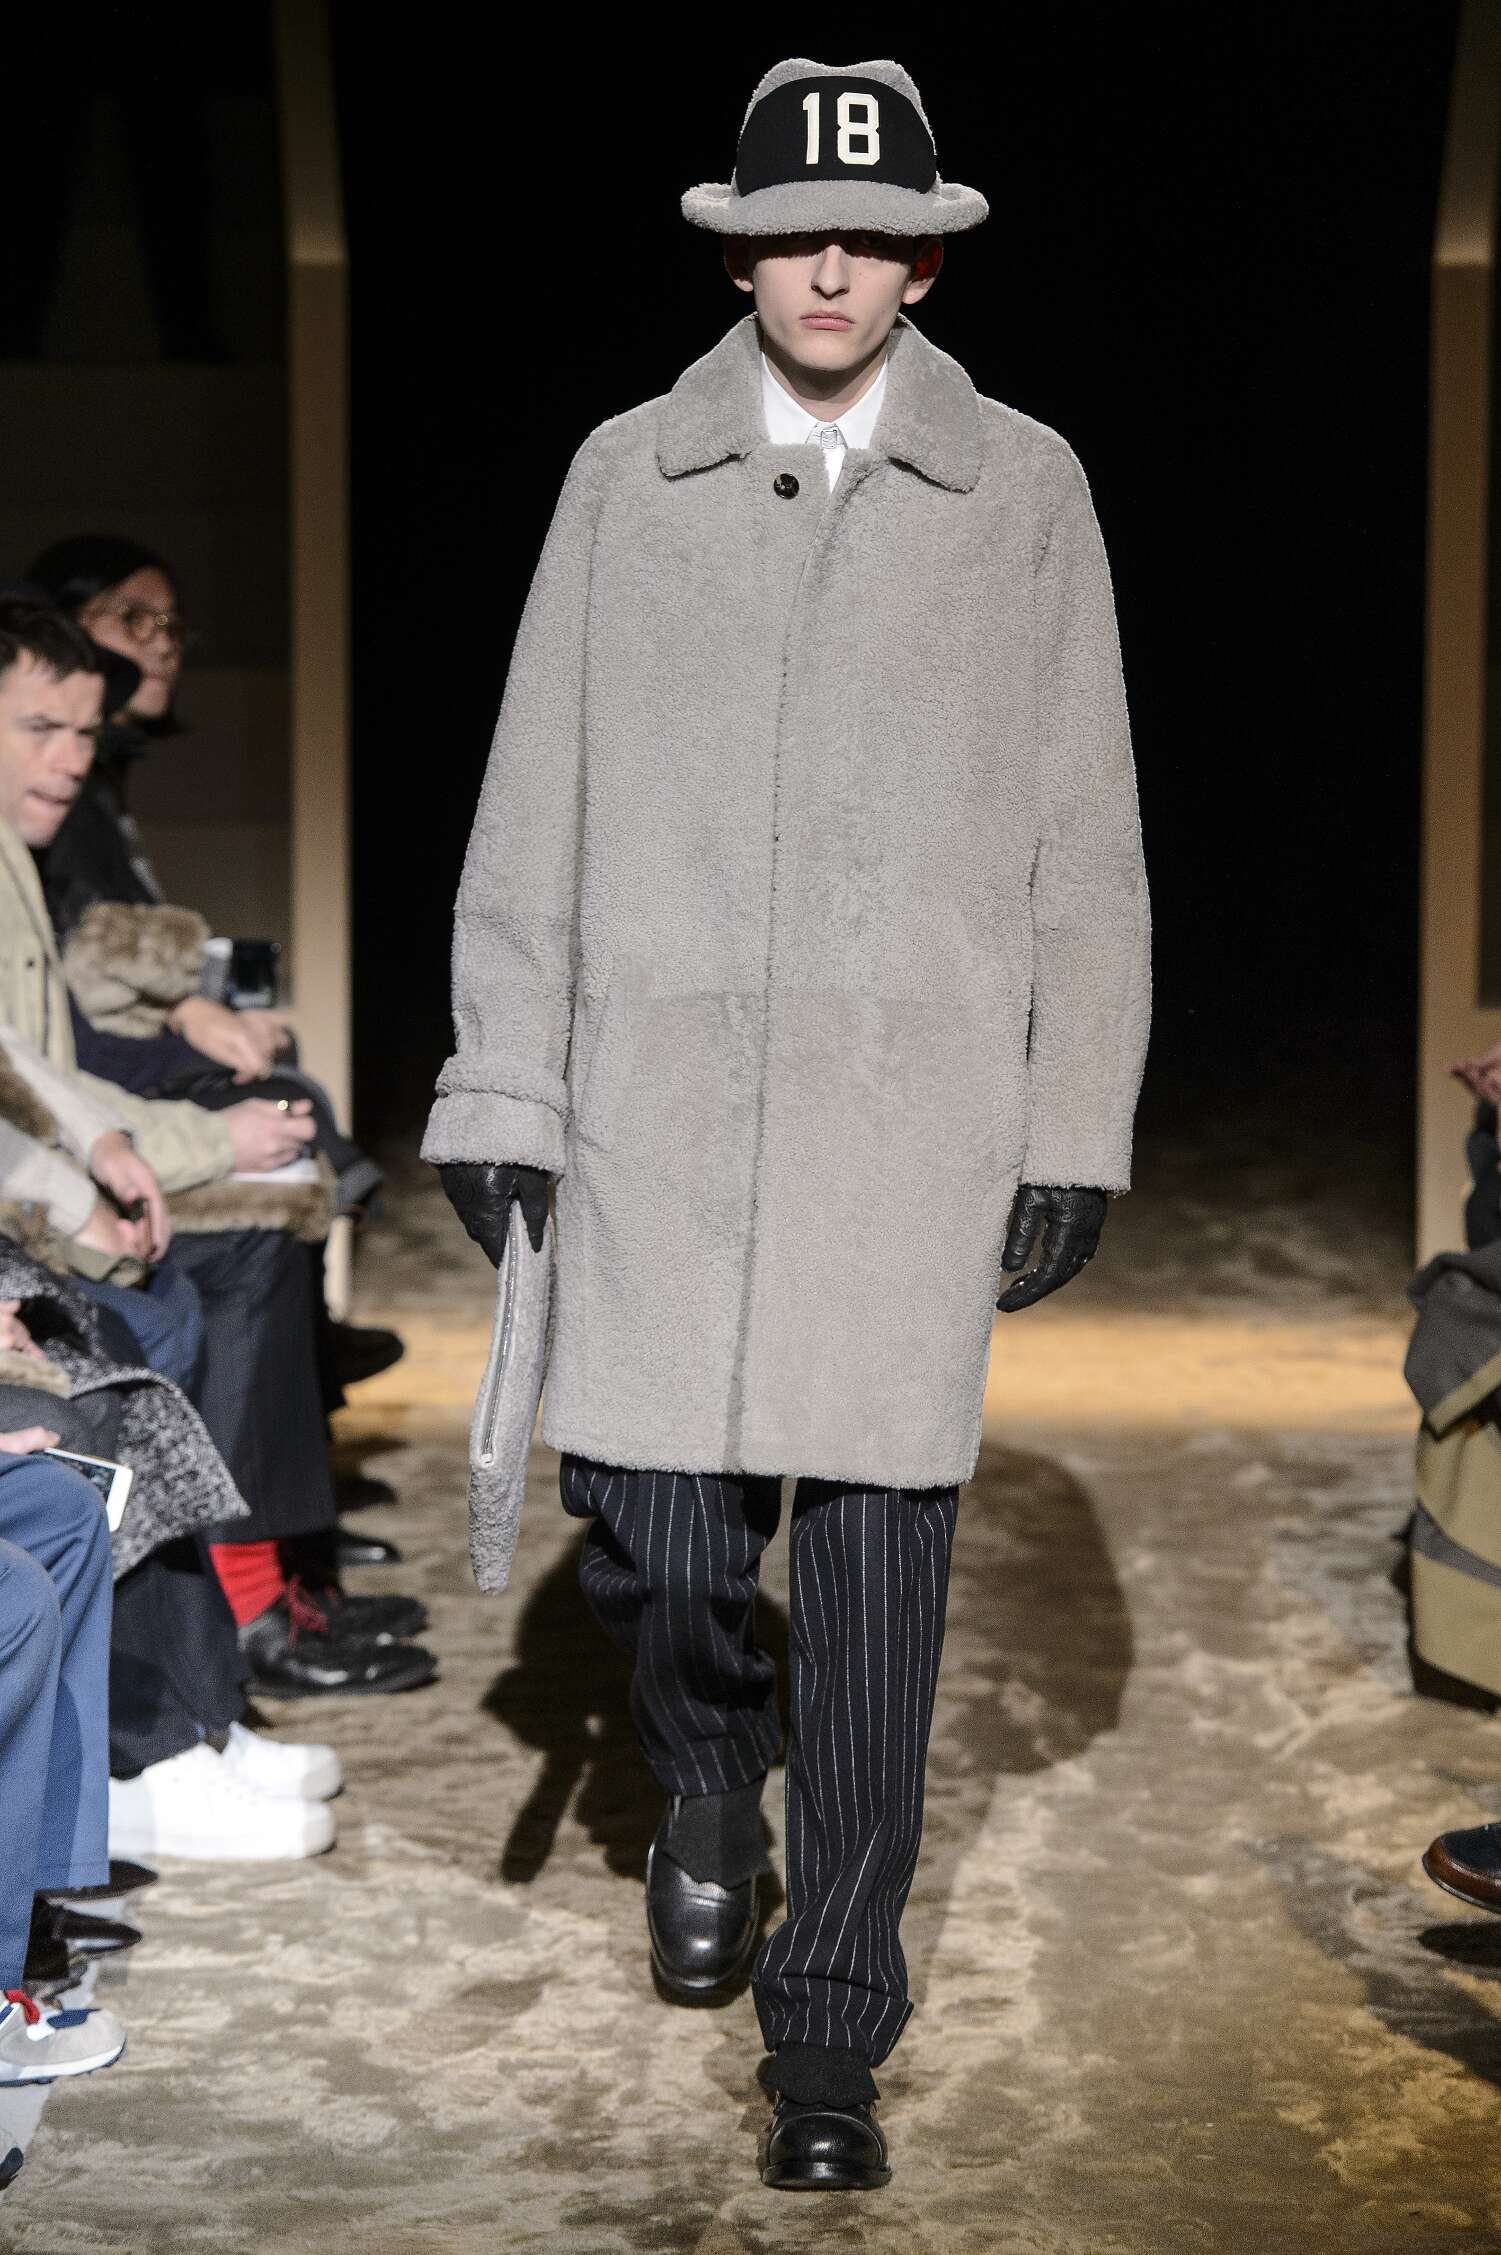 Fashion Man Model Ermenegildo Zegna Couture Catwalk